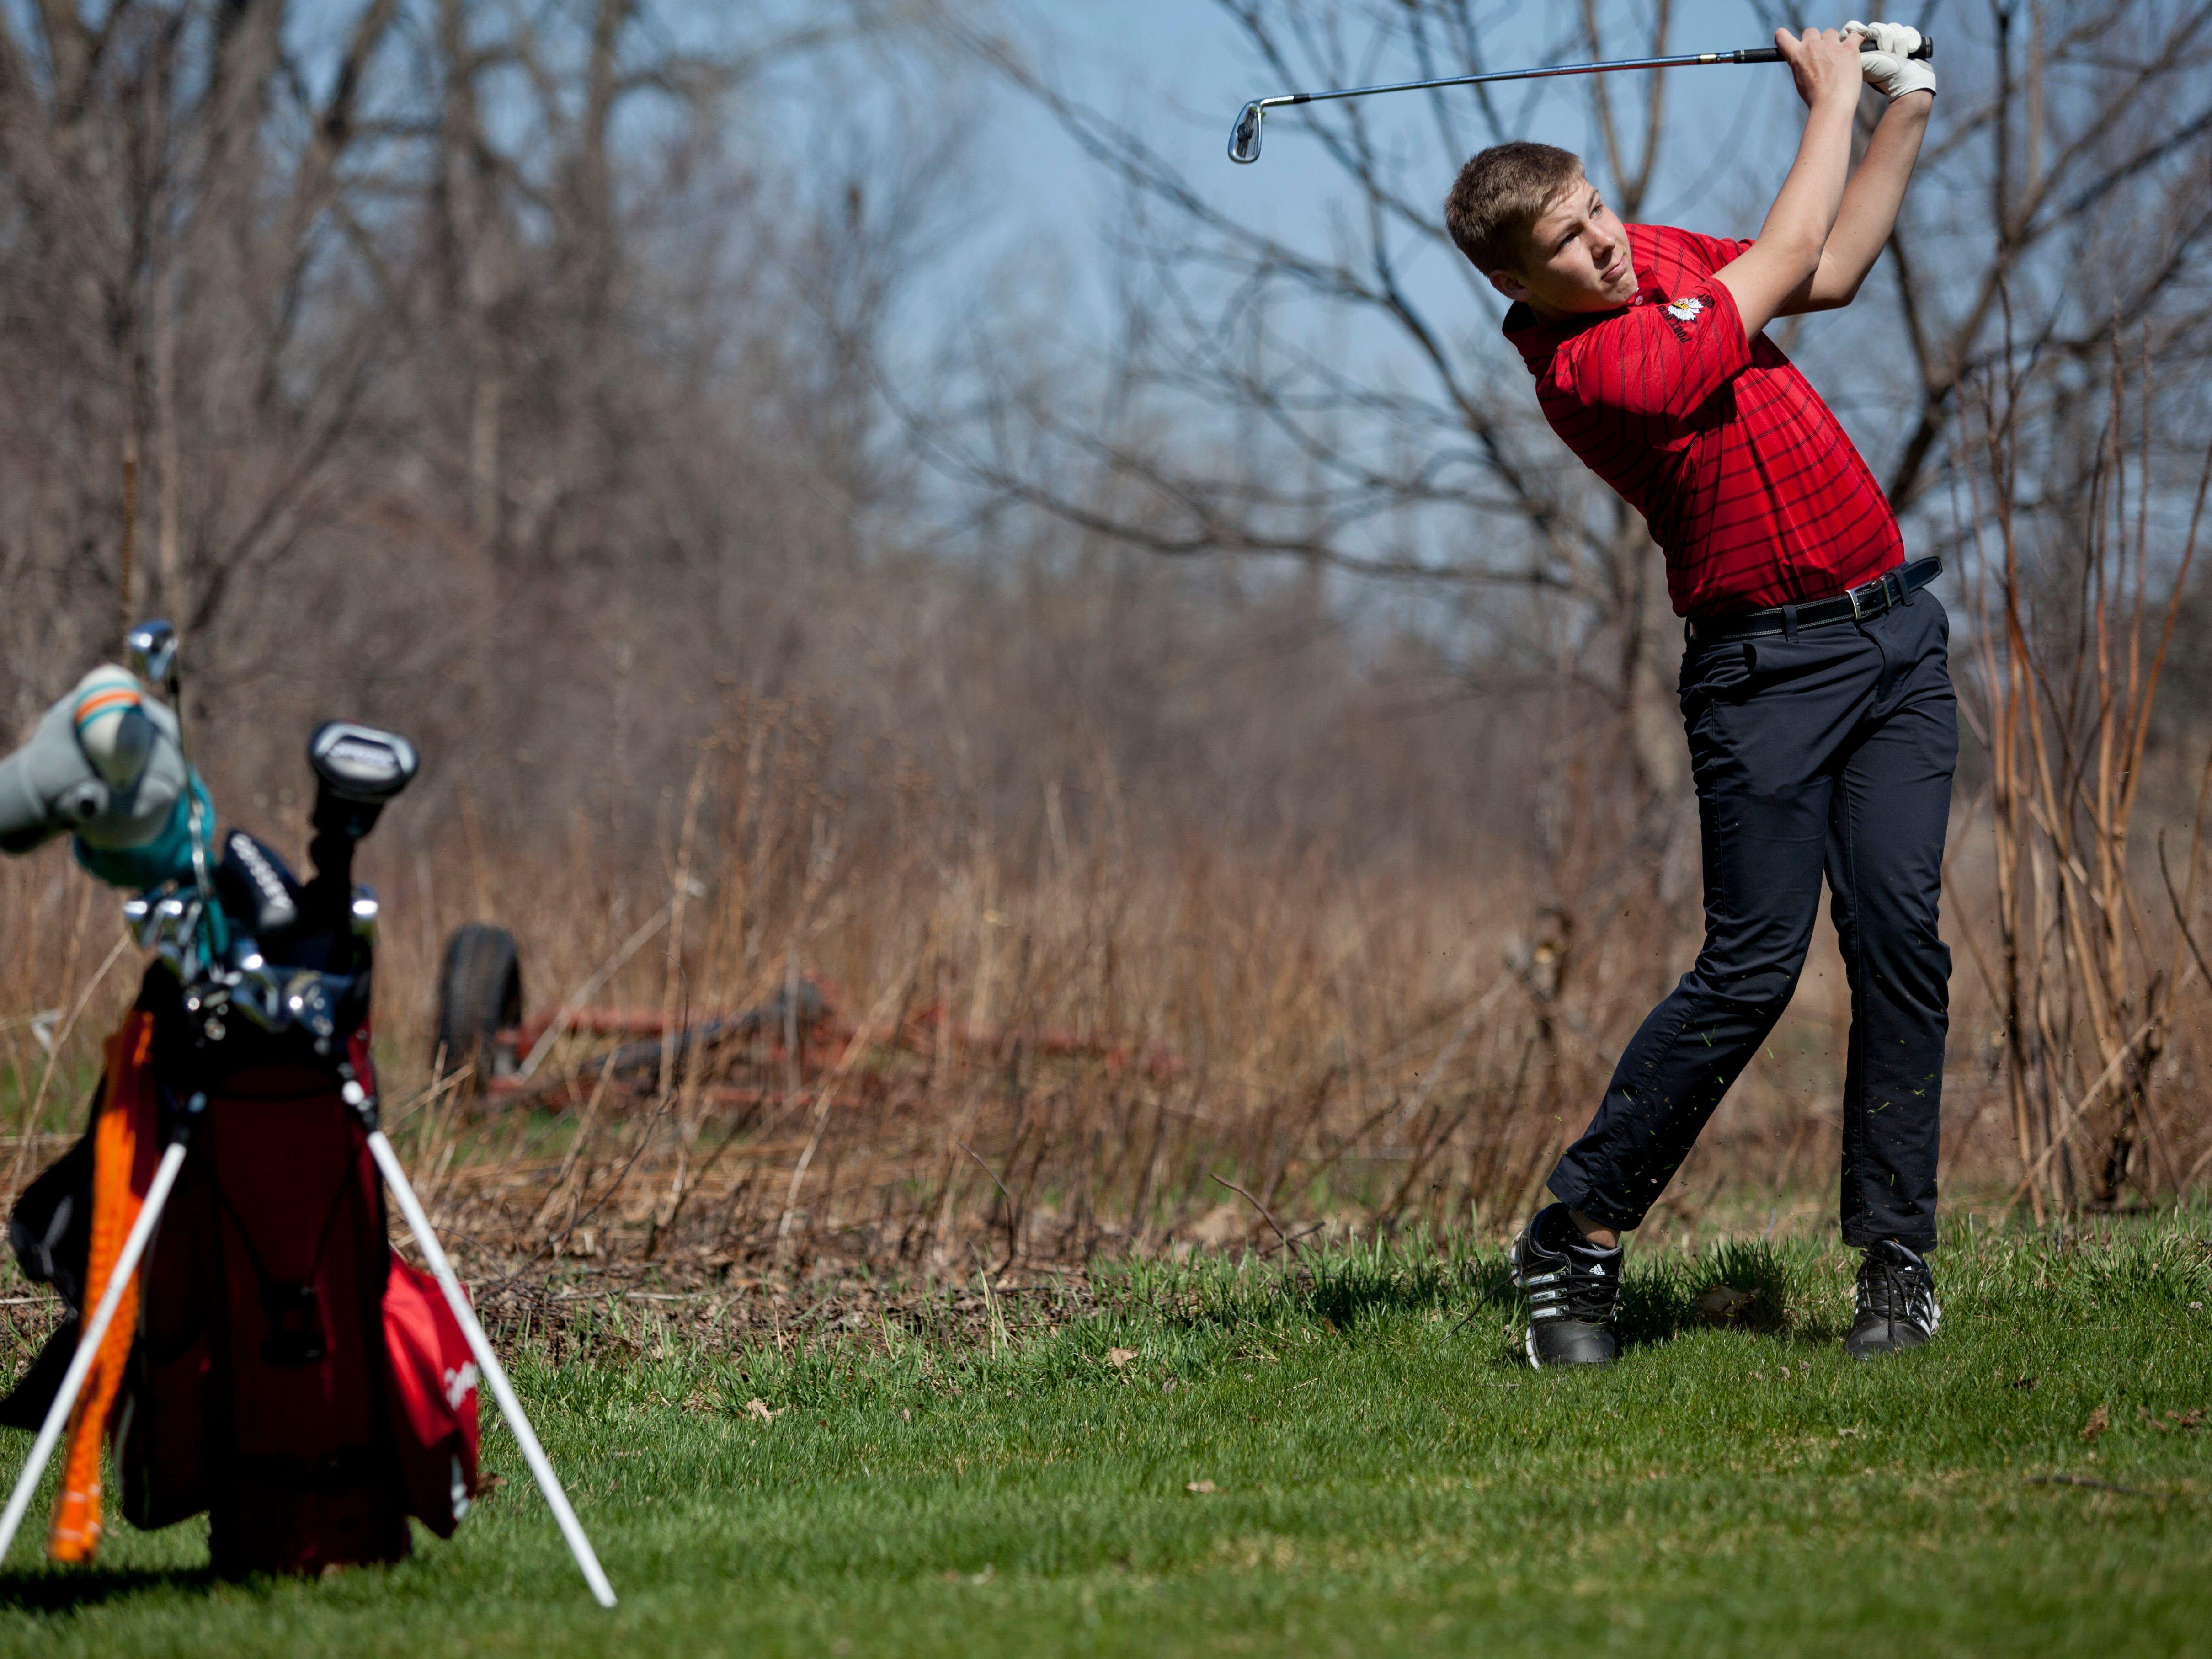 Port Huron freshman Nick Bailey, 14, takes a shot Friday, April 17, 2015 at the Port Huron Elks Golf Club in Port Huron Township.